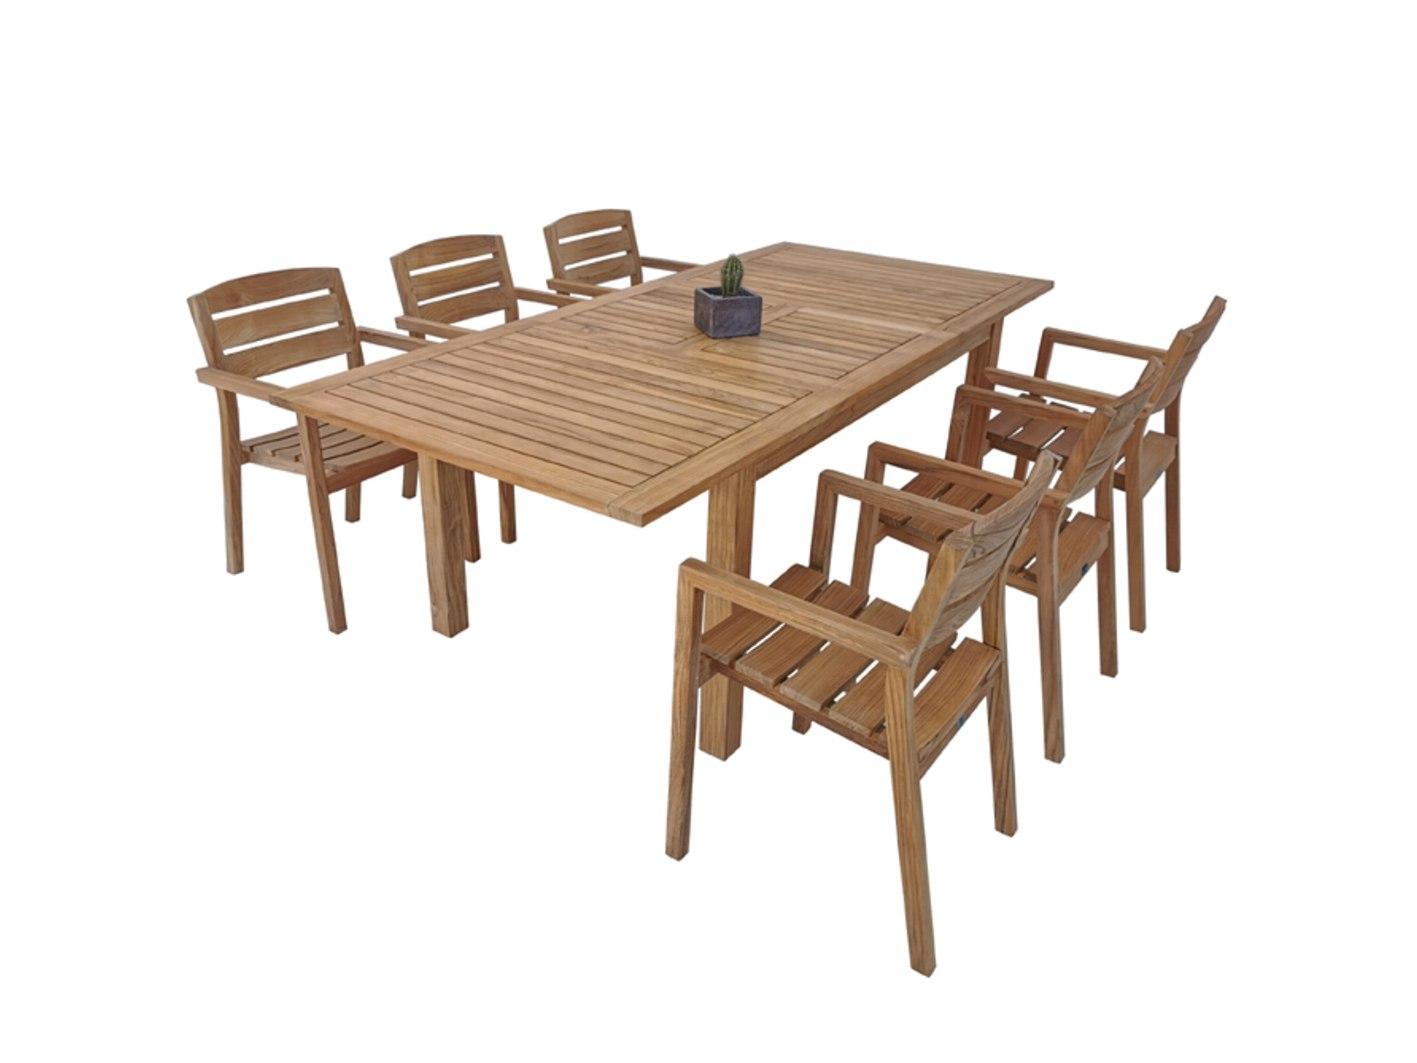 Raztegljiva miza